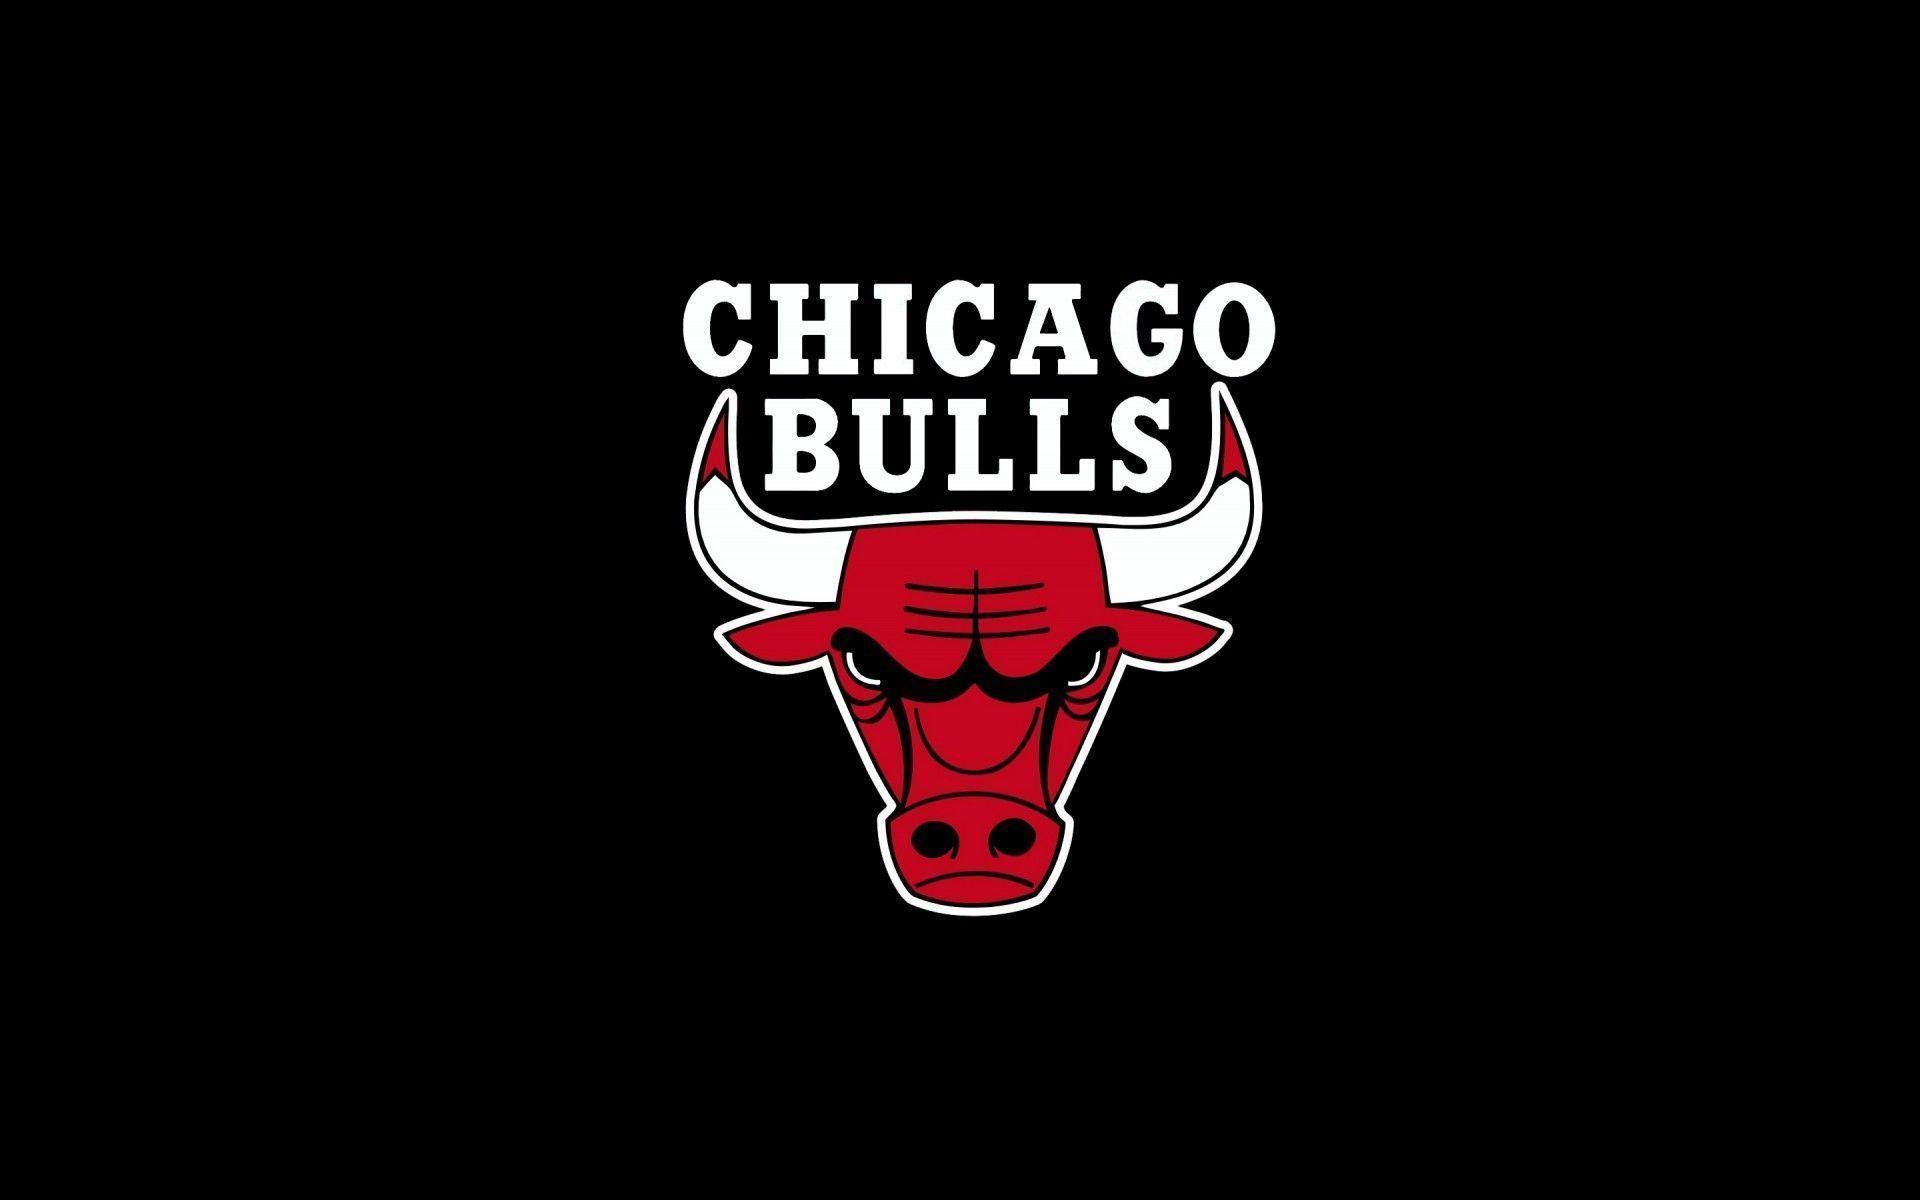 Chicago Bulls Wallpapers HD 2016